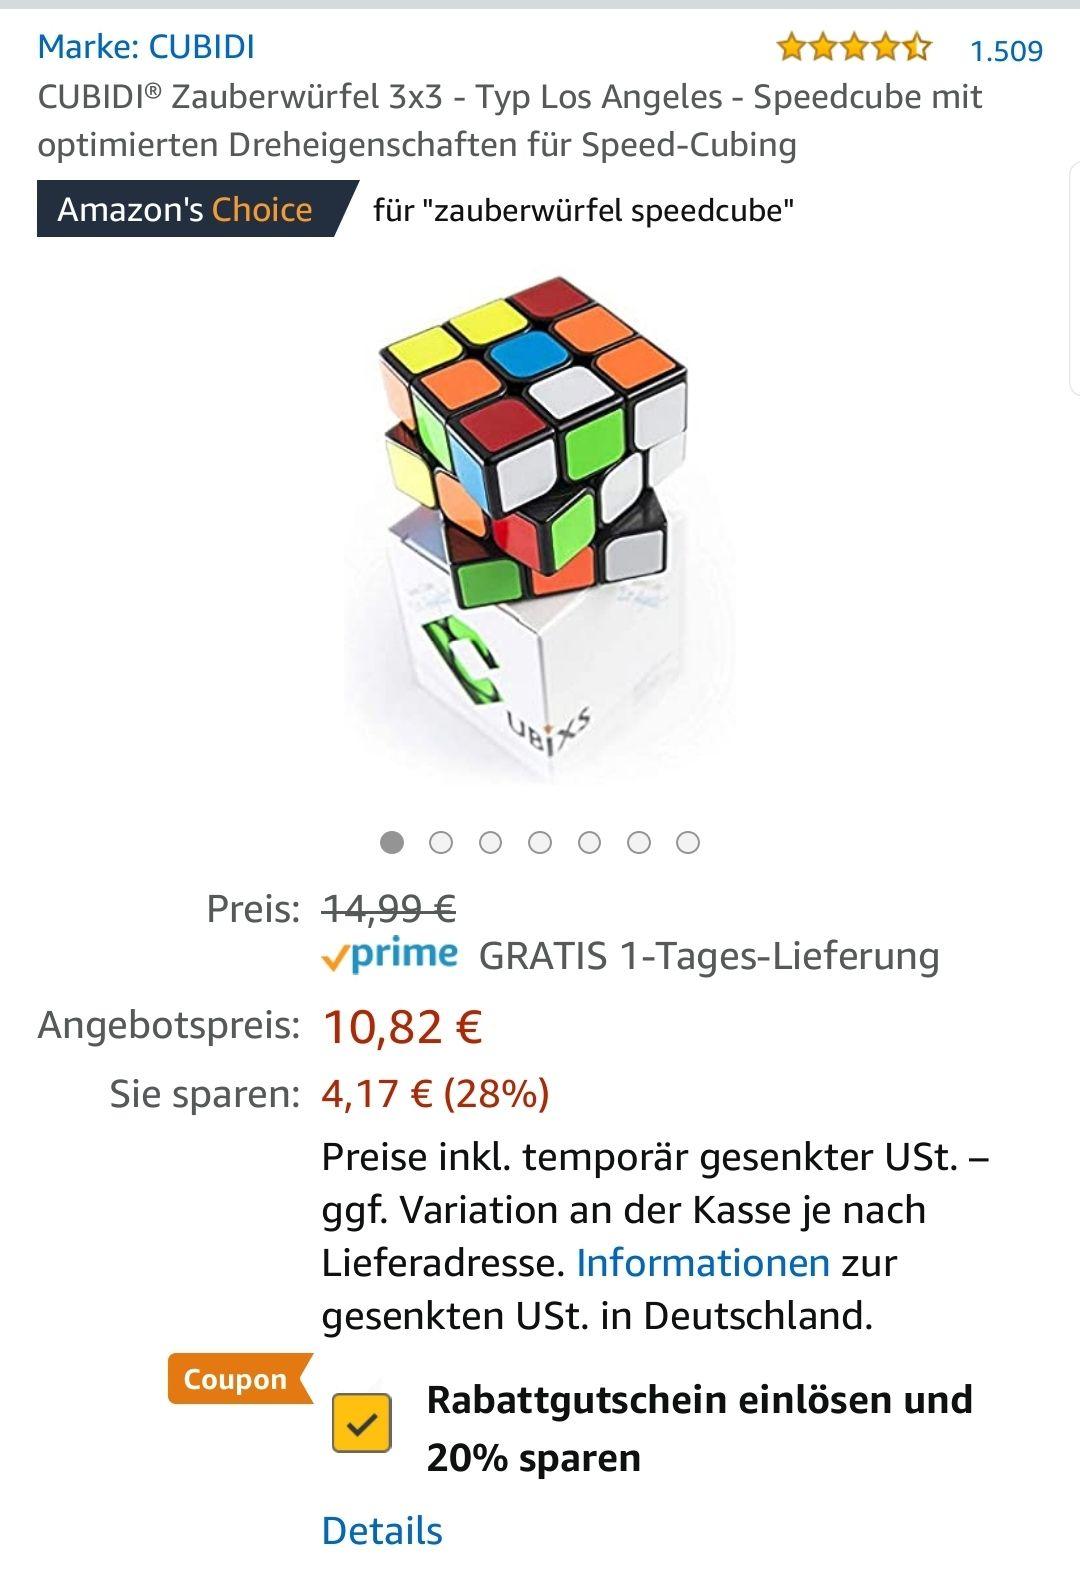 CUBIDI Speedcube 3x3 - Typ Los Angeles - Blitzangebot Amazon - Bestpreis